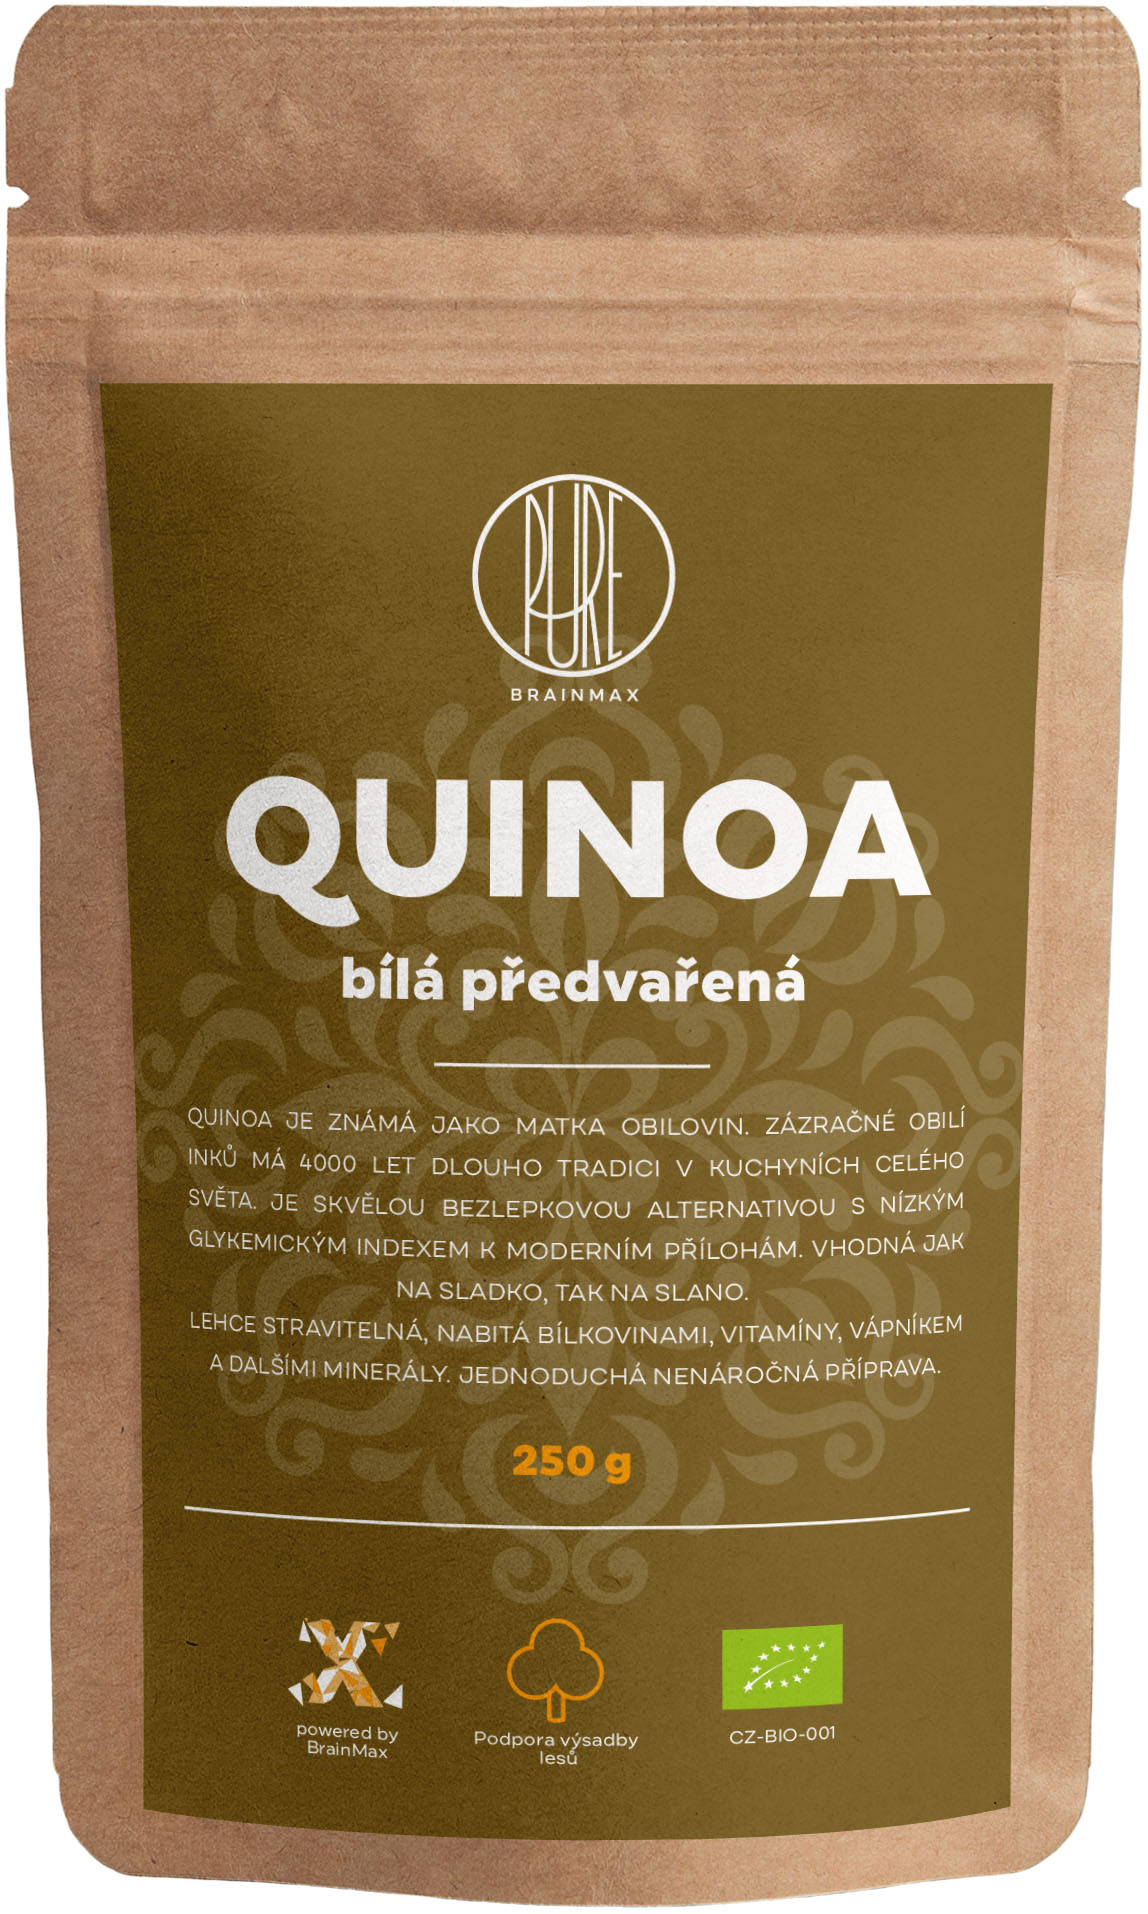 BrainMax Pure Quinoa BIO - biela predvarená, 250 g *CZ-BIO-001 certifikát